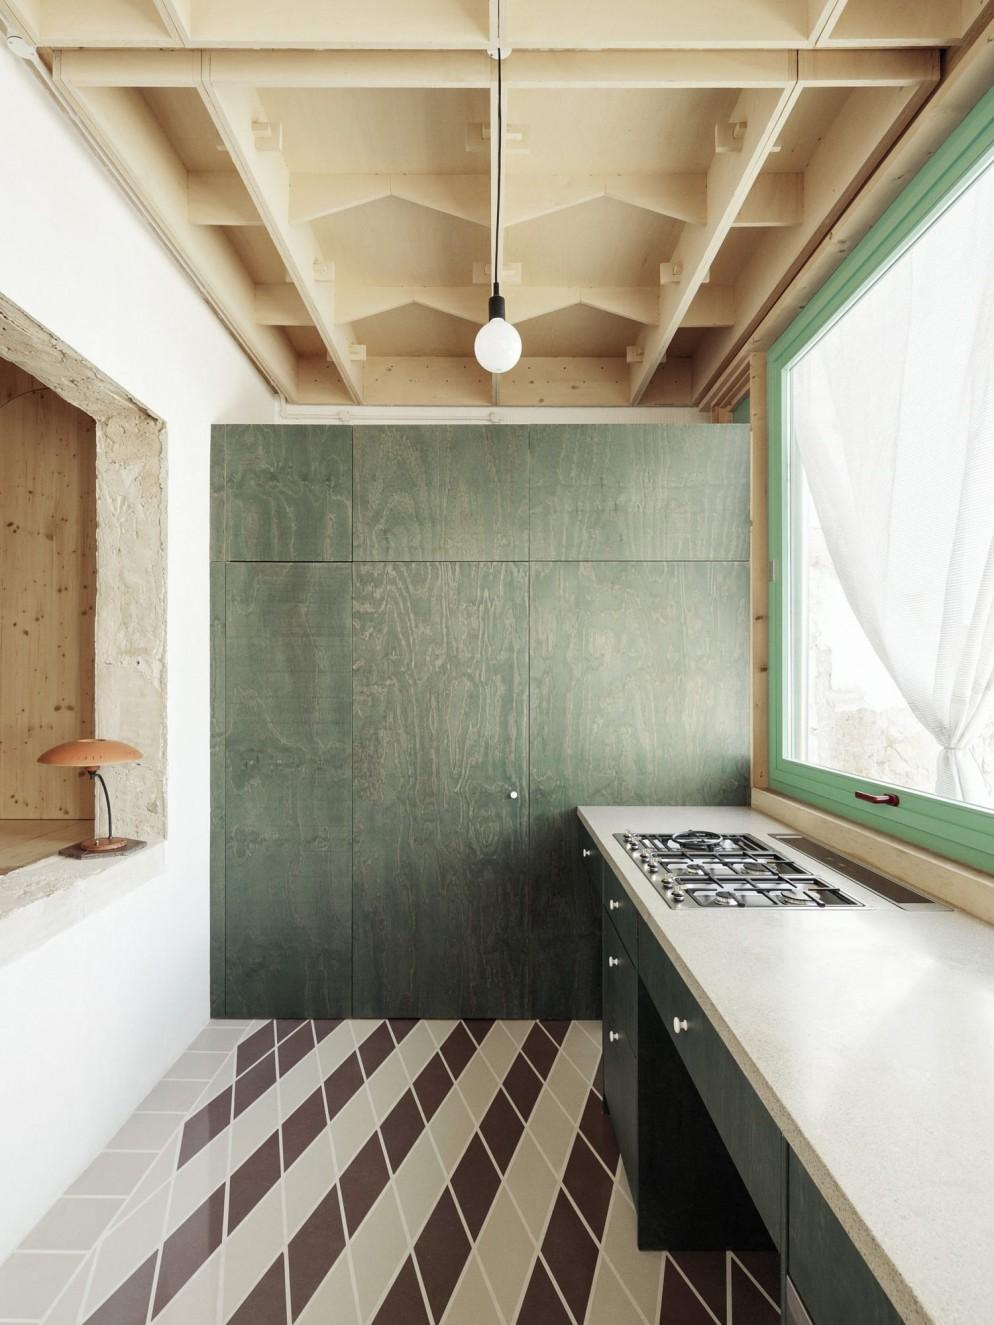 Colore In Cucina 14 Idee Per Dipingere Le Pareti